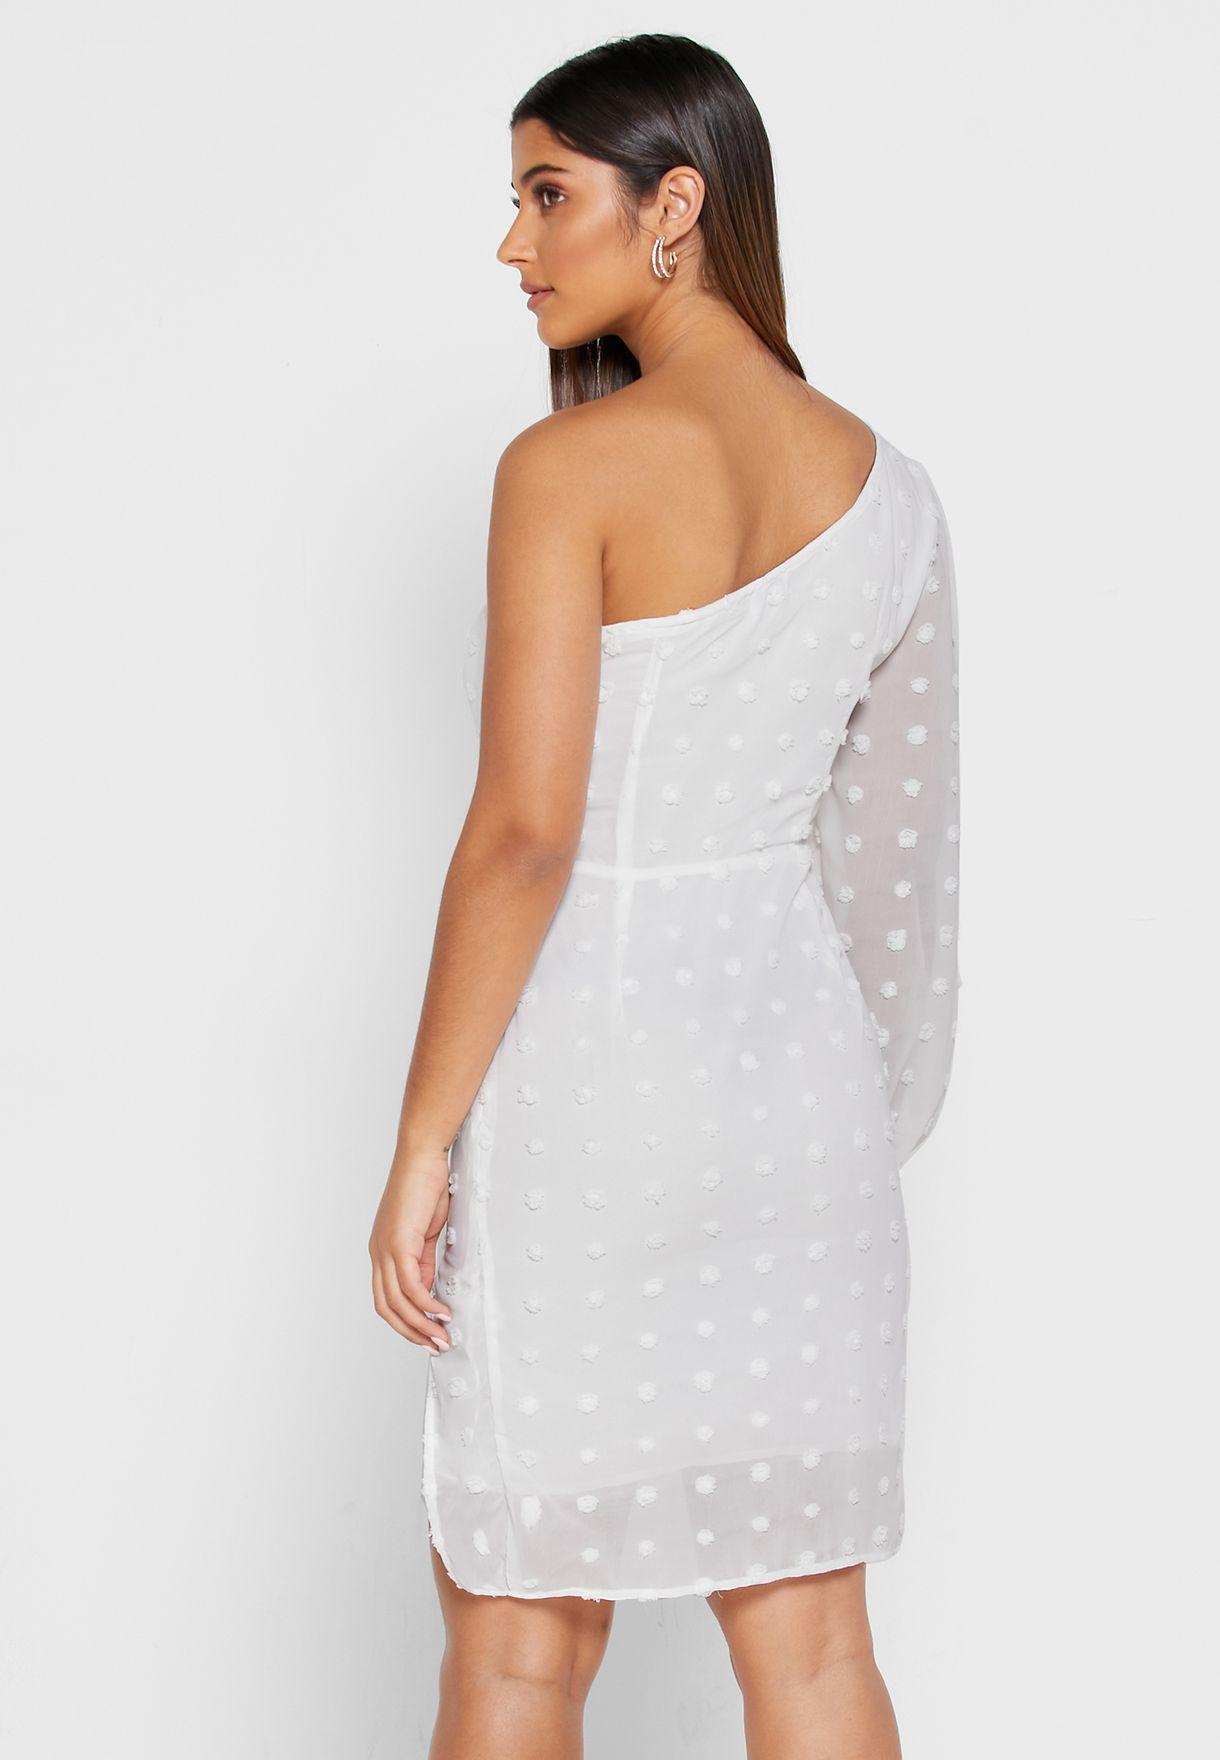 Dotted One Shoulder Mini Dress